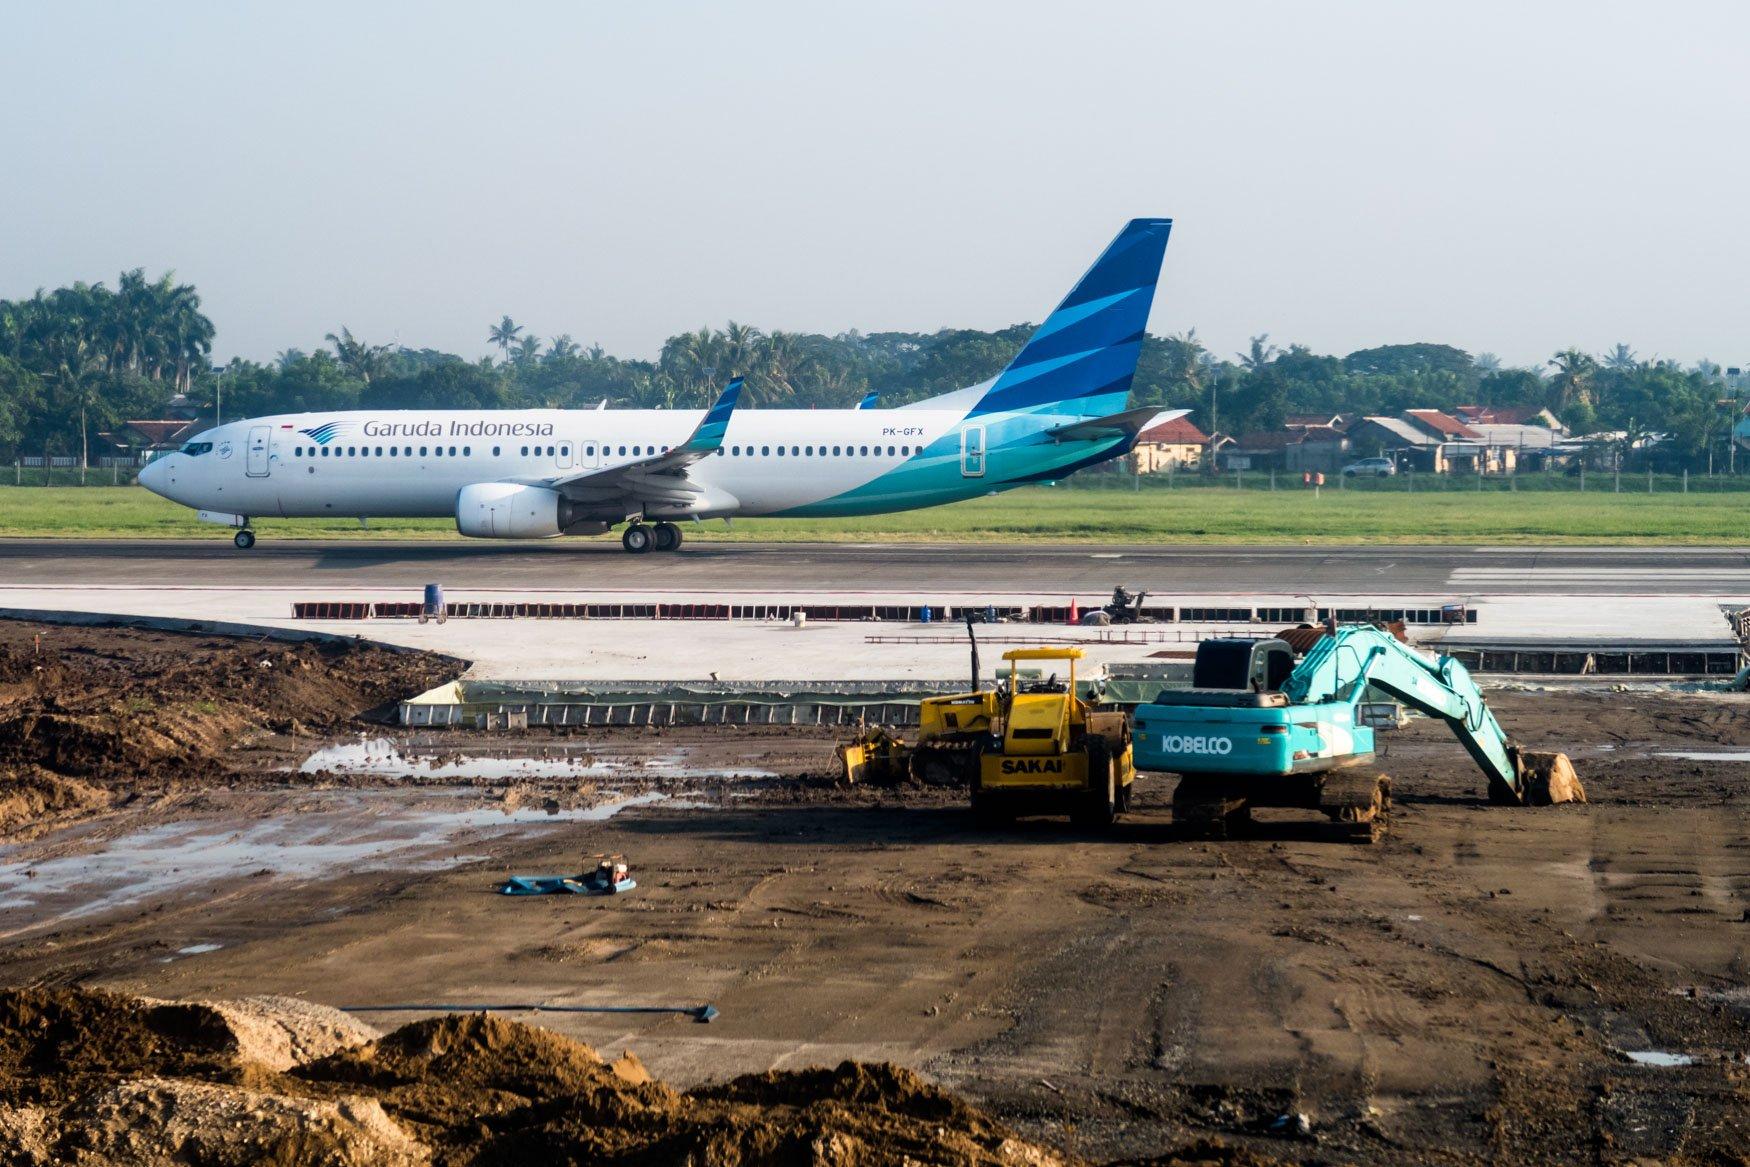 Jakarta Airport Construction and Garuda Indonesia